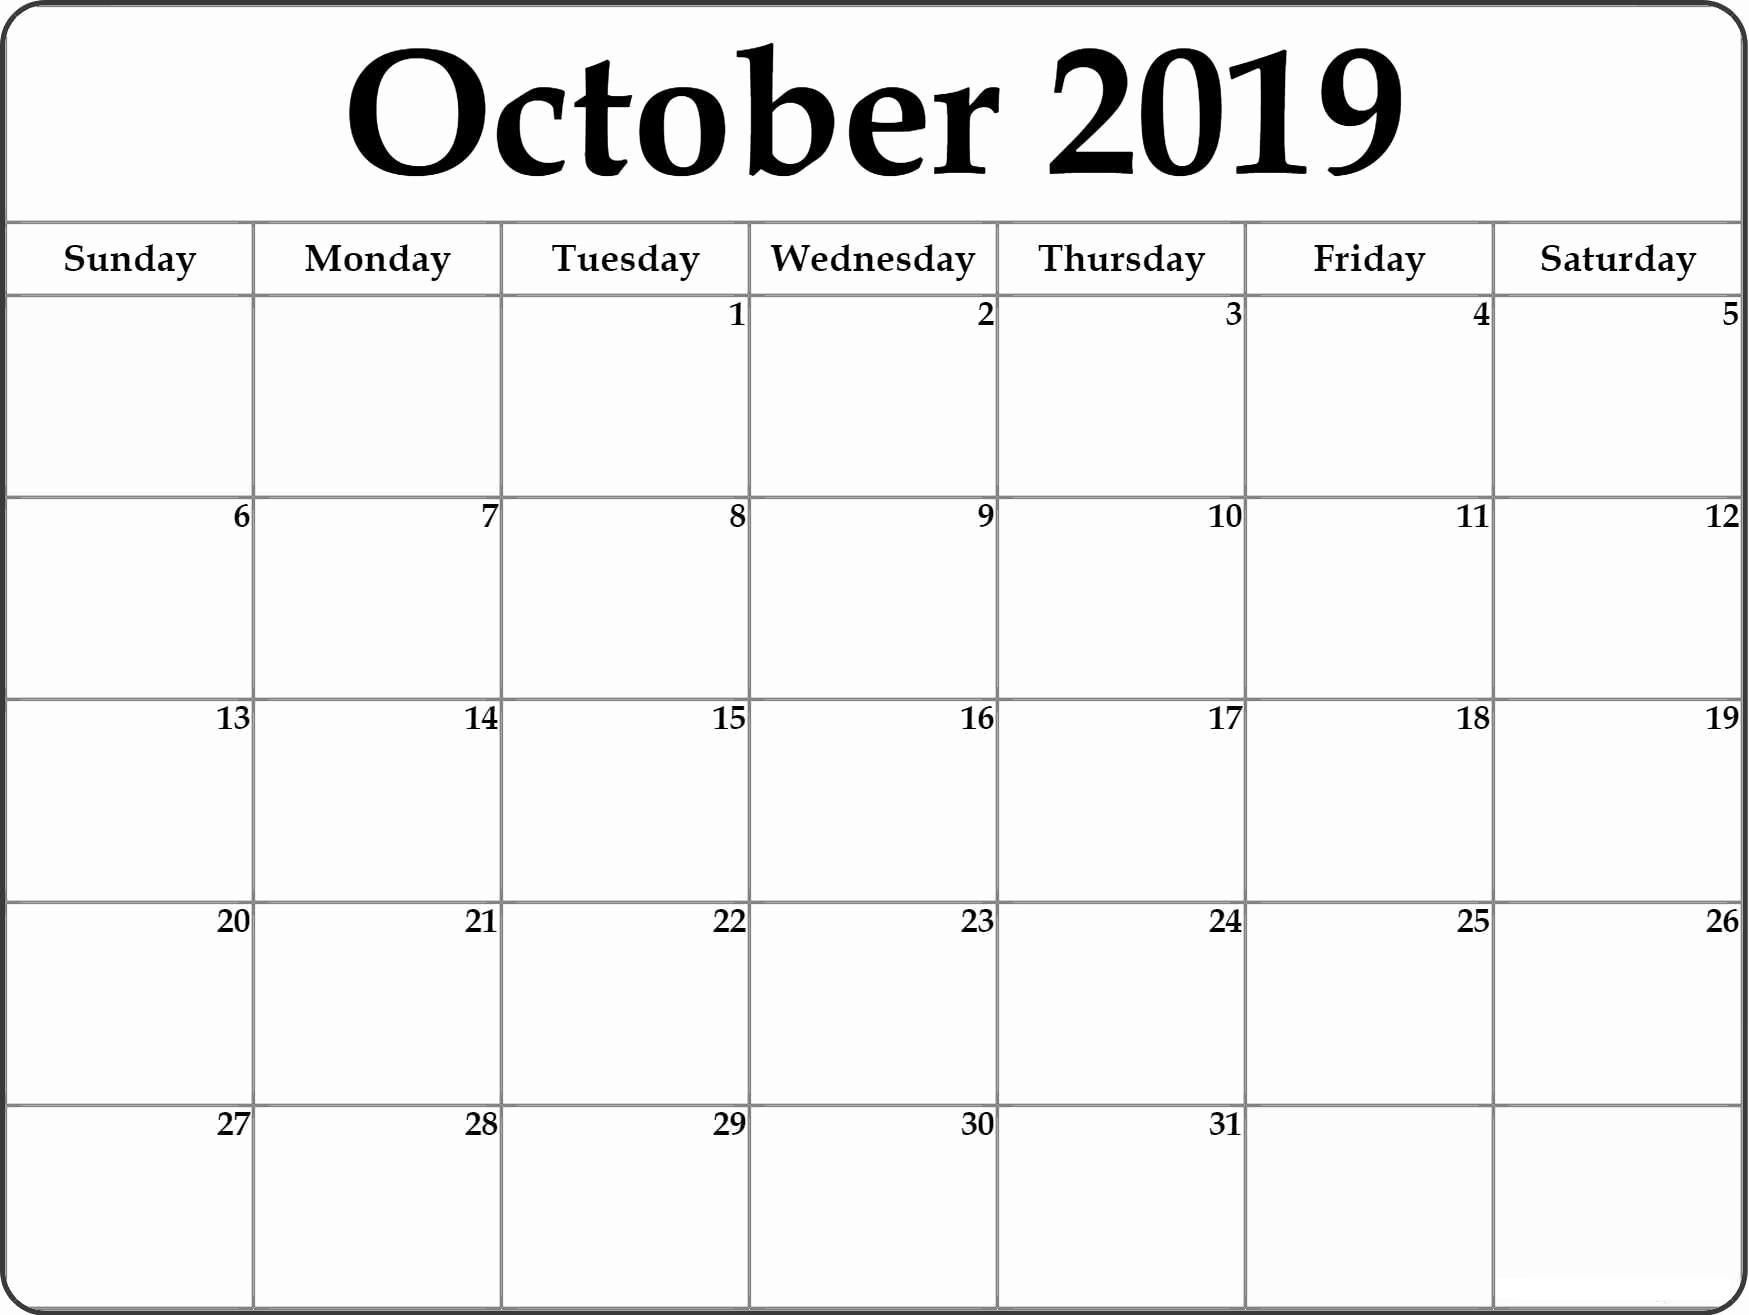 October 2019 Printable Calendar - Free August 2019 Calendar